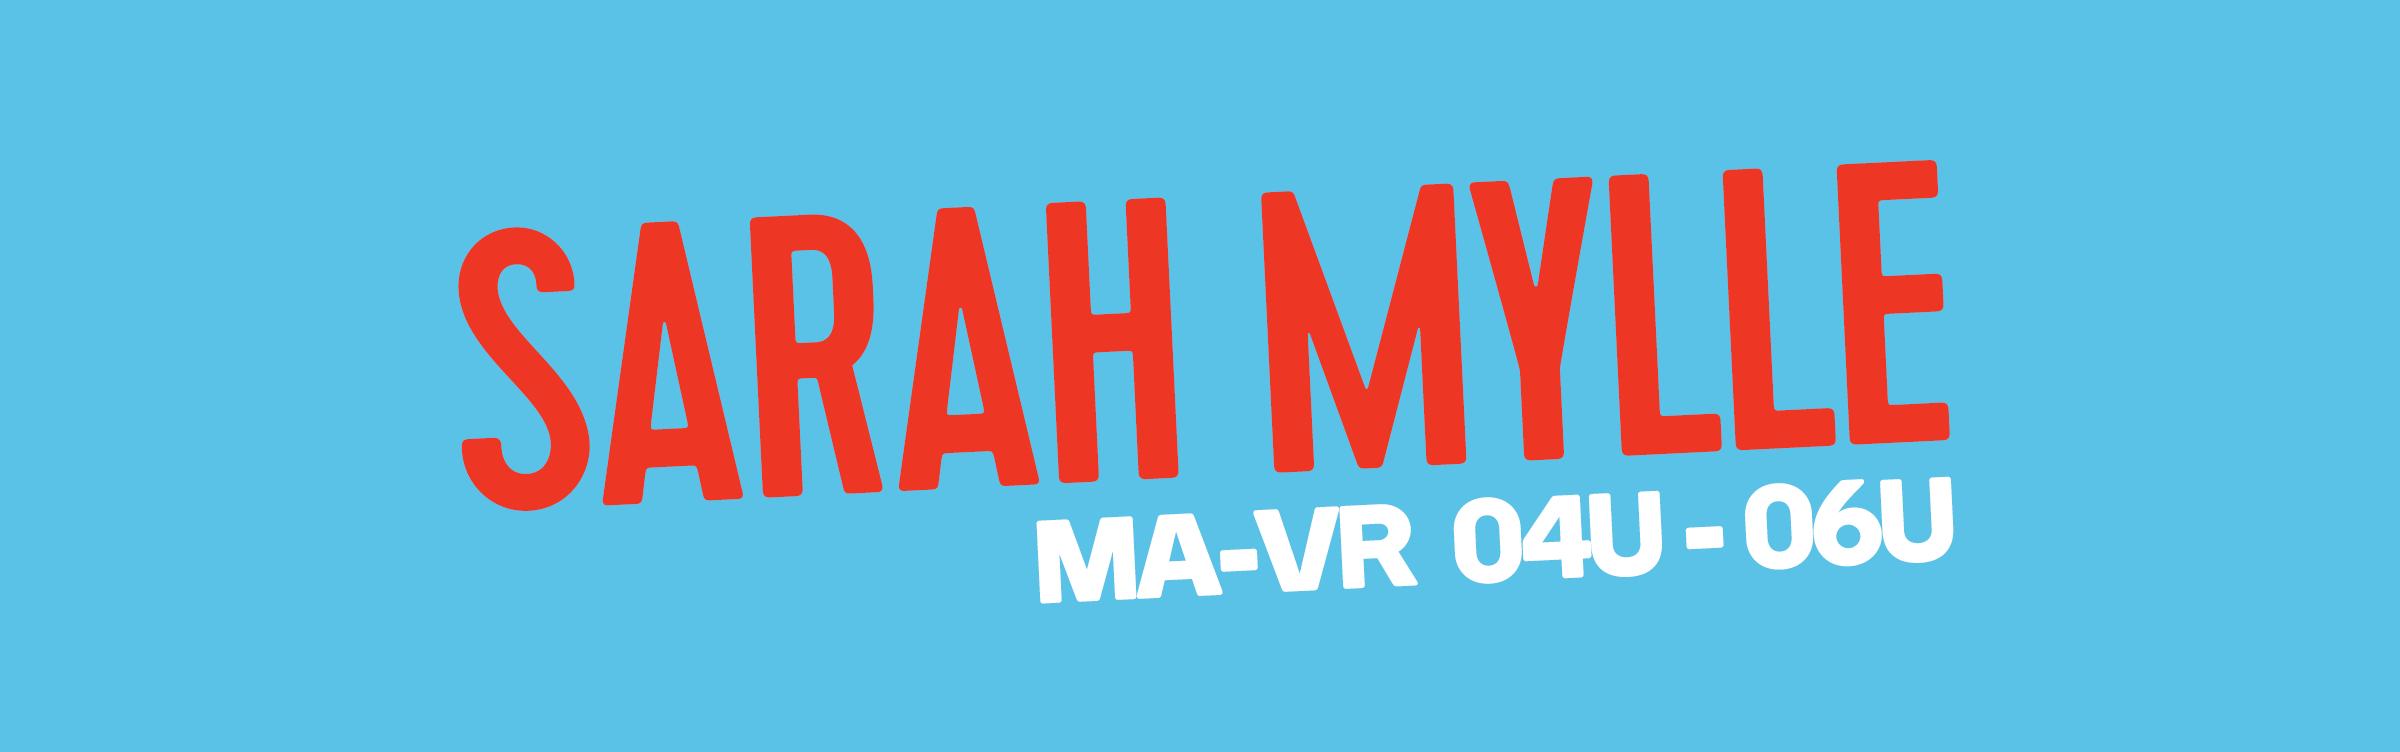 Sarah Mylle